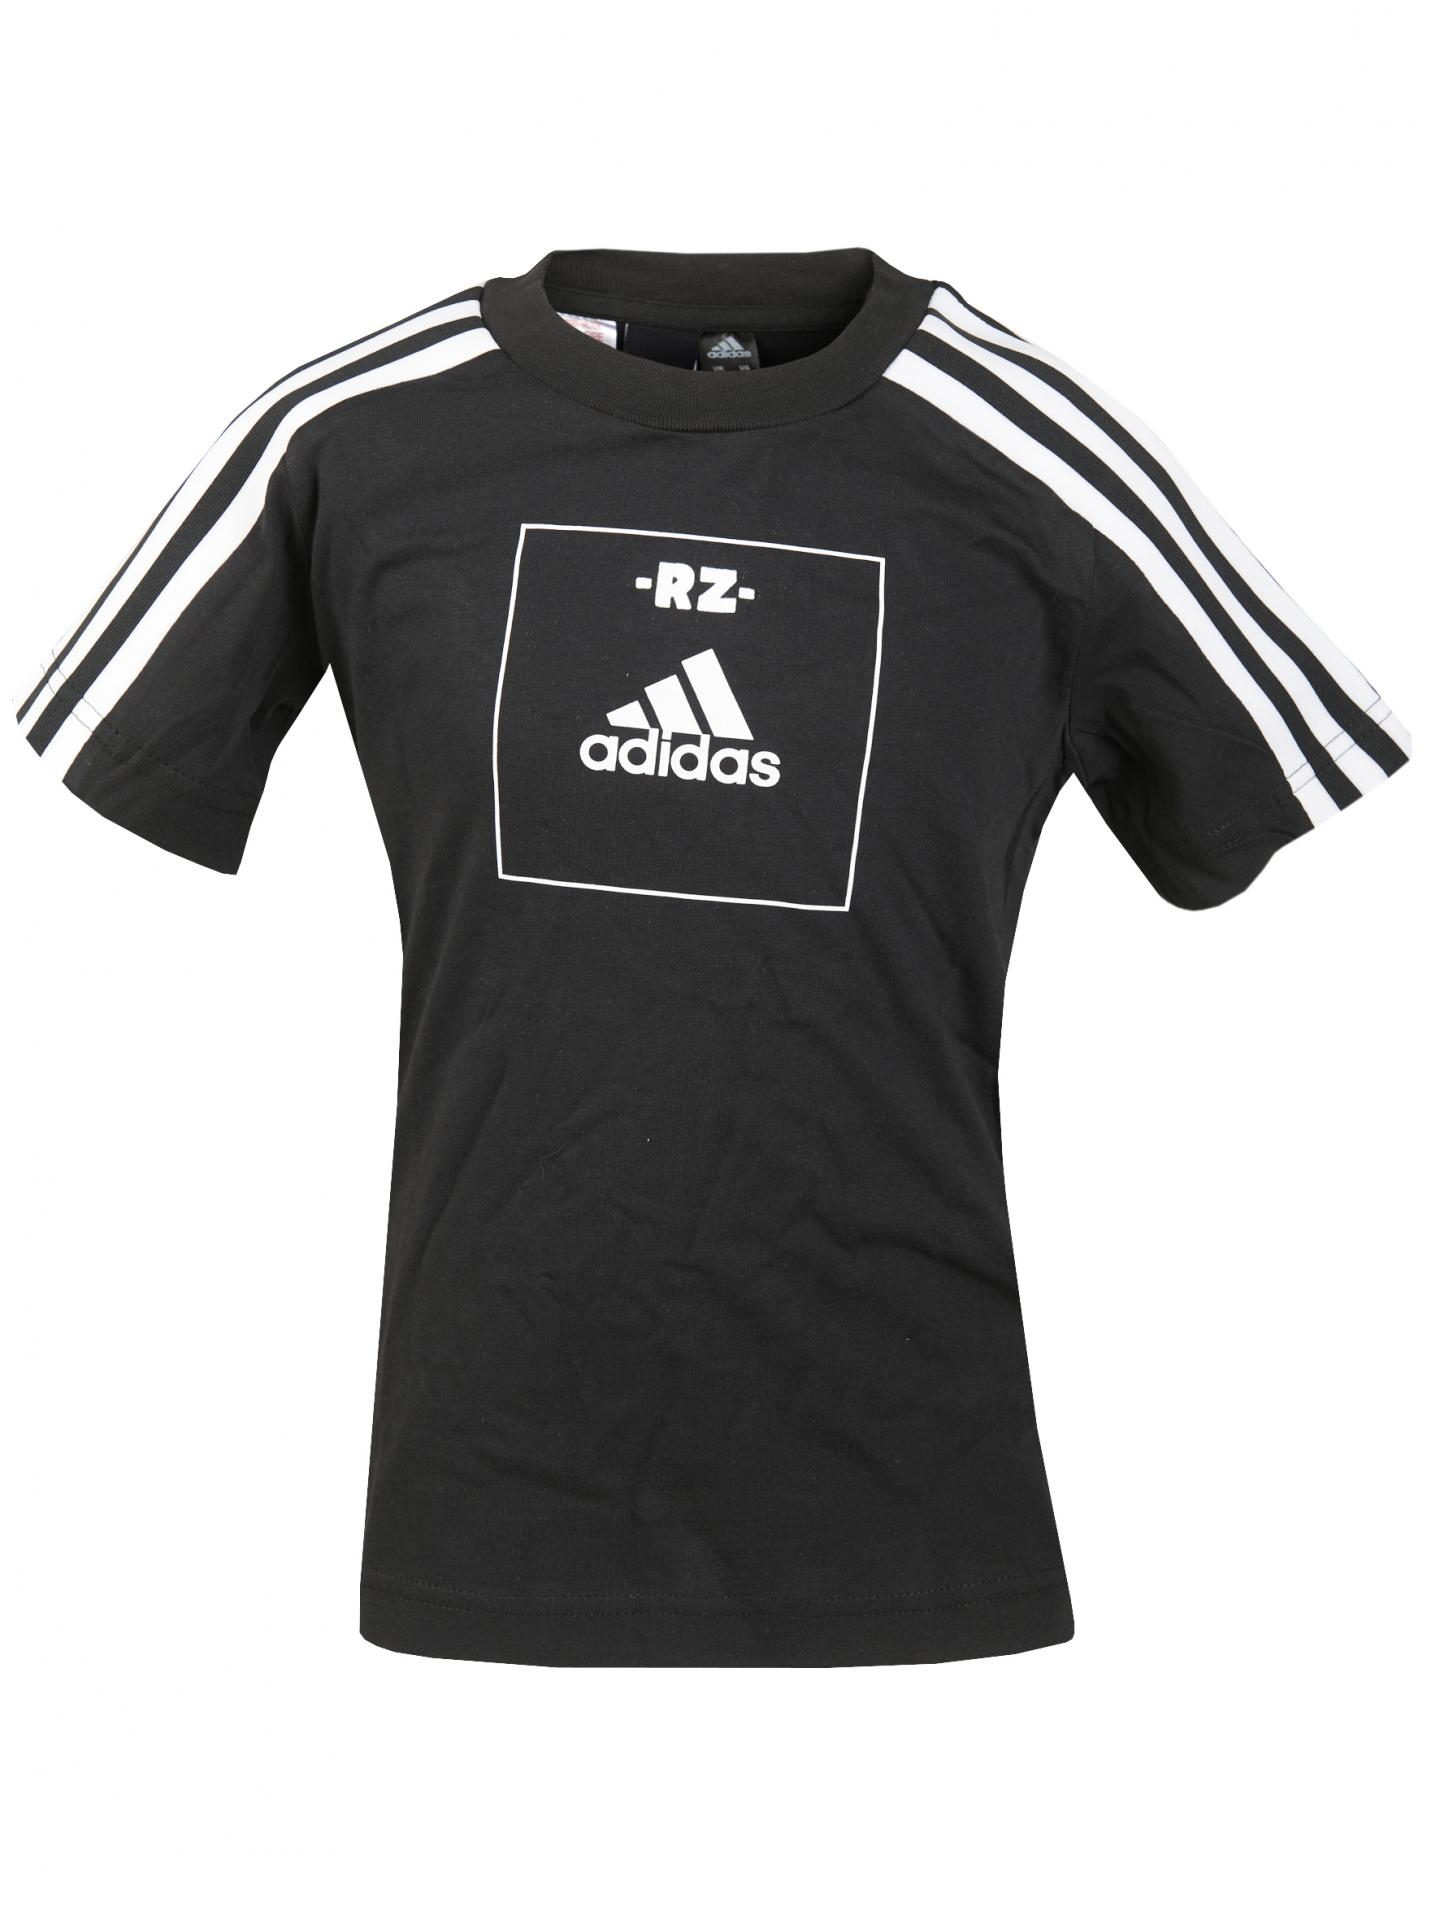 Camiseta infantil adidas logo